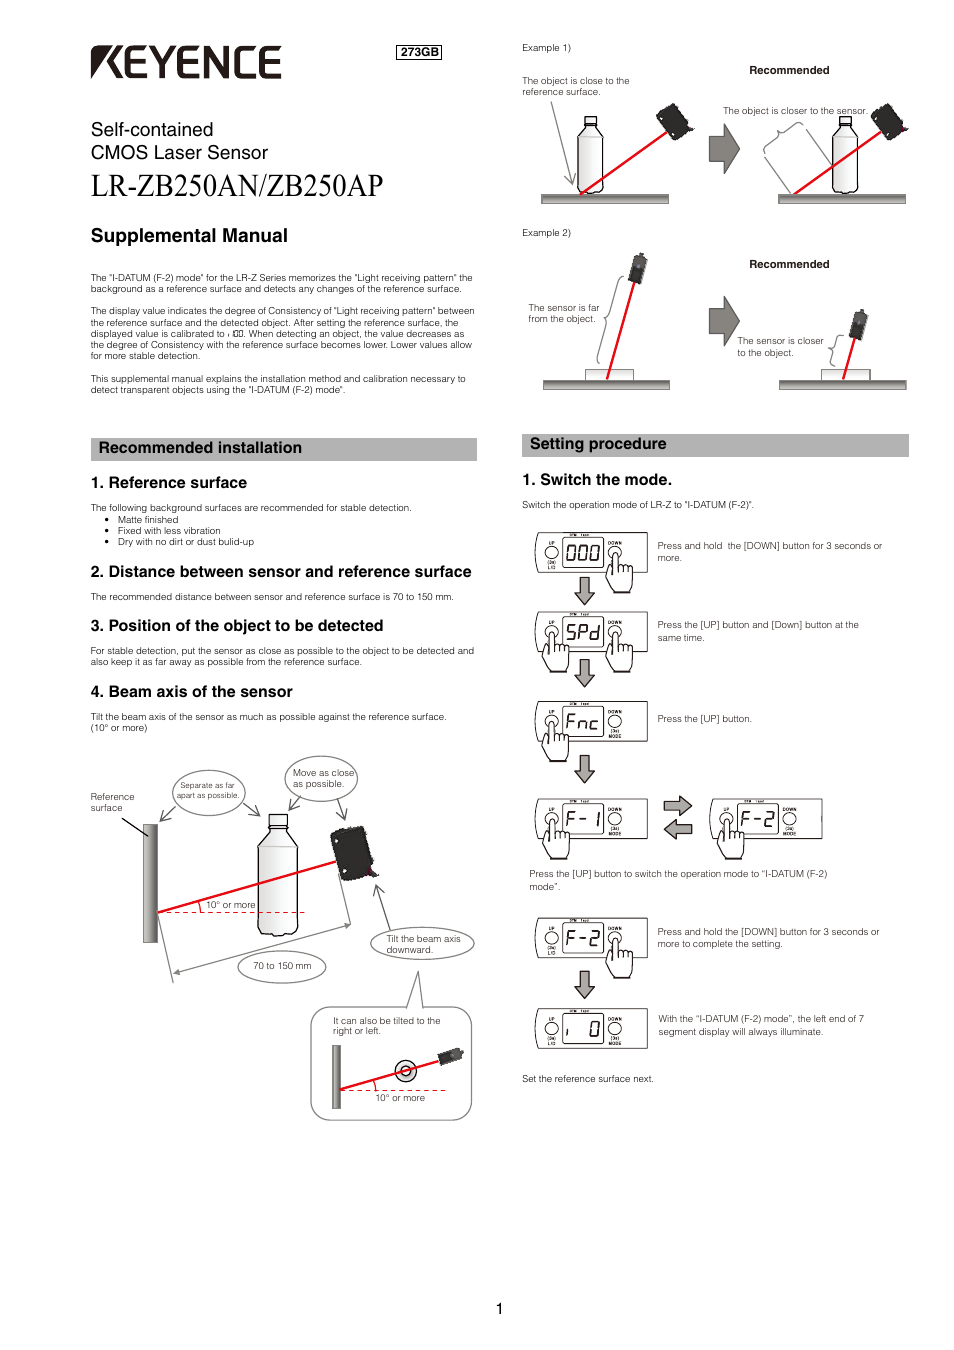 keyence lr zb250ap manual pdf